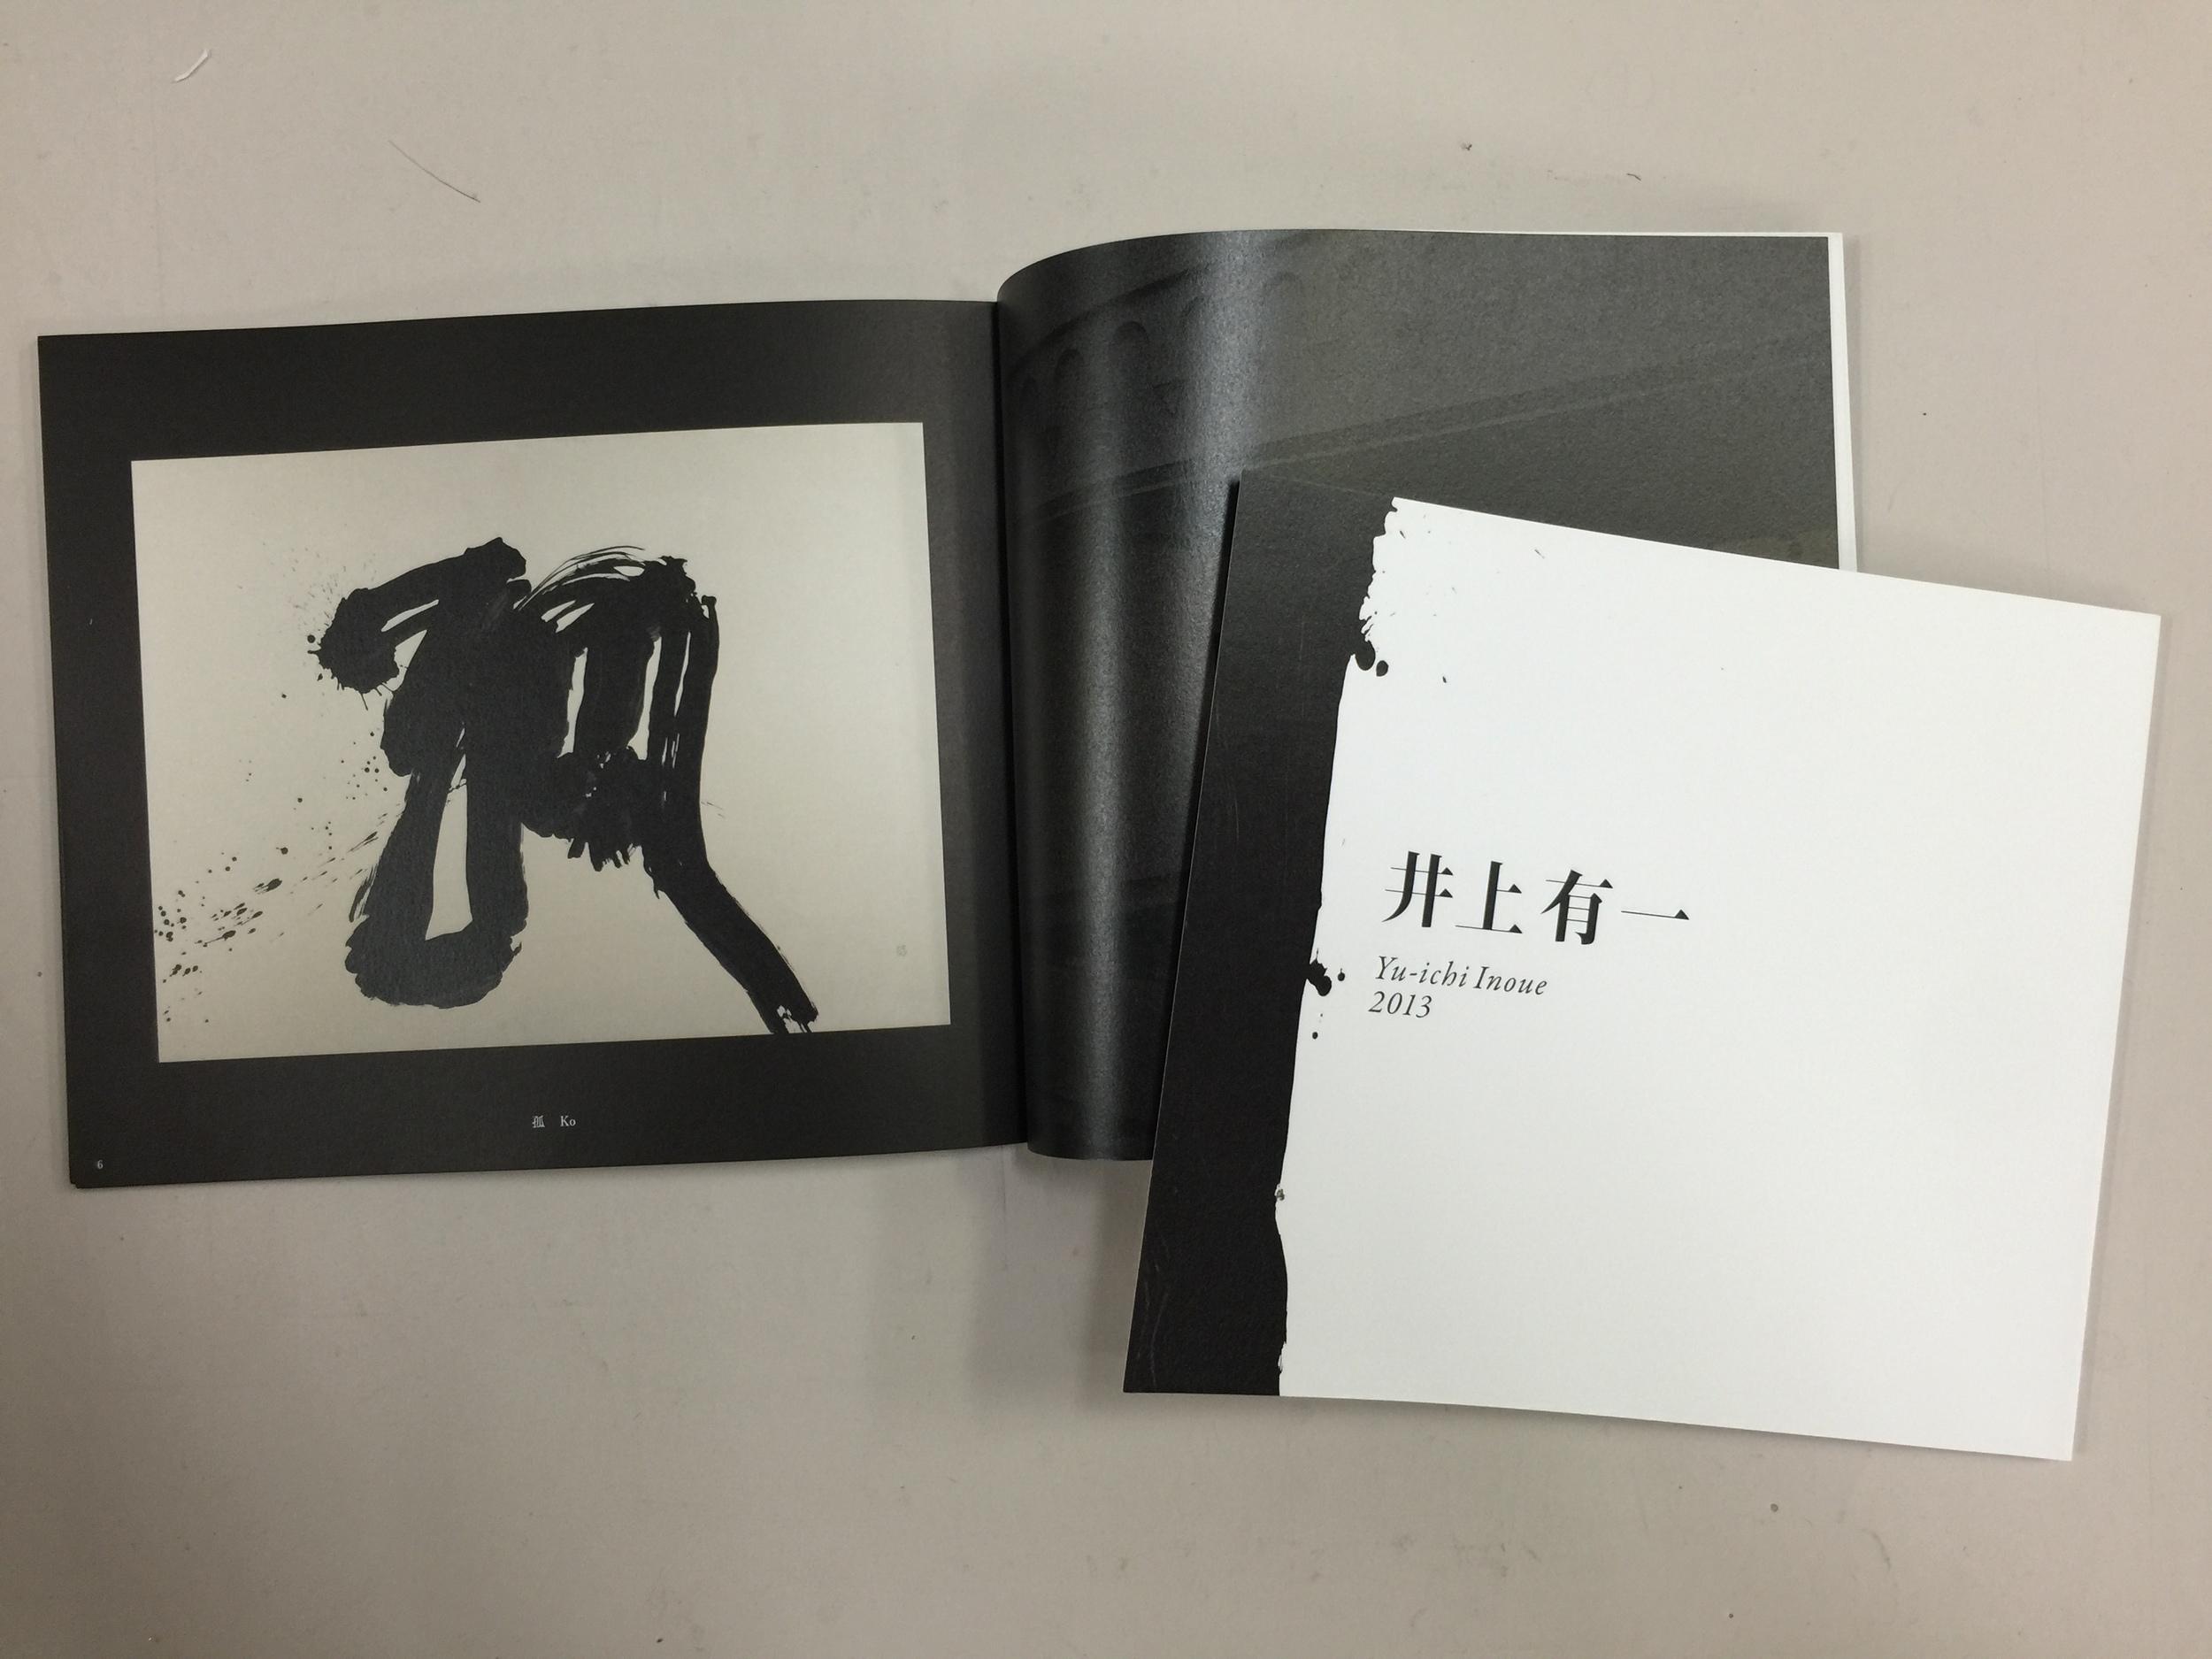 Yuichi_Sharjah-bienniale_Koyama_book